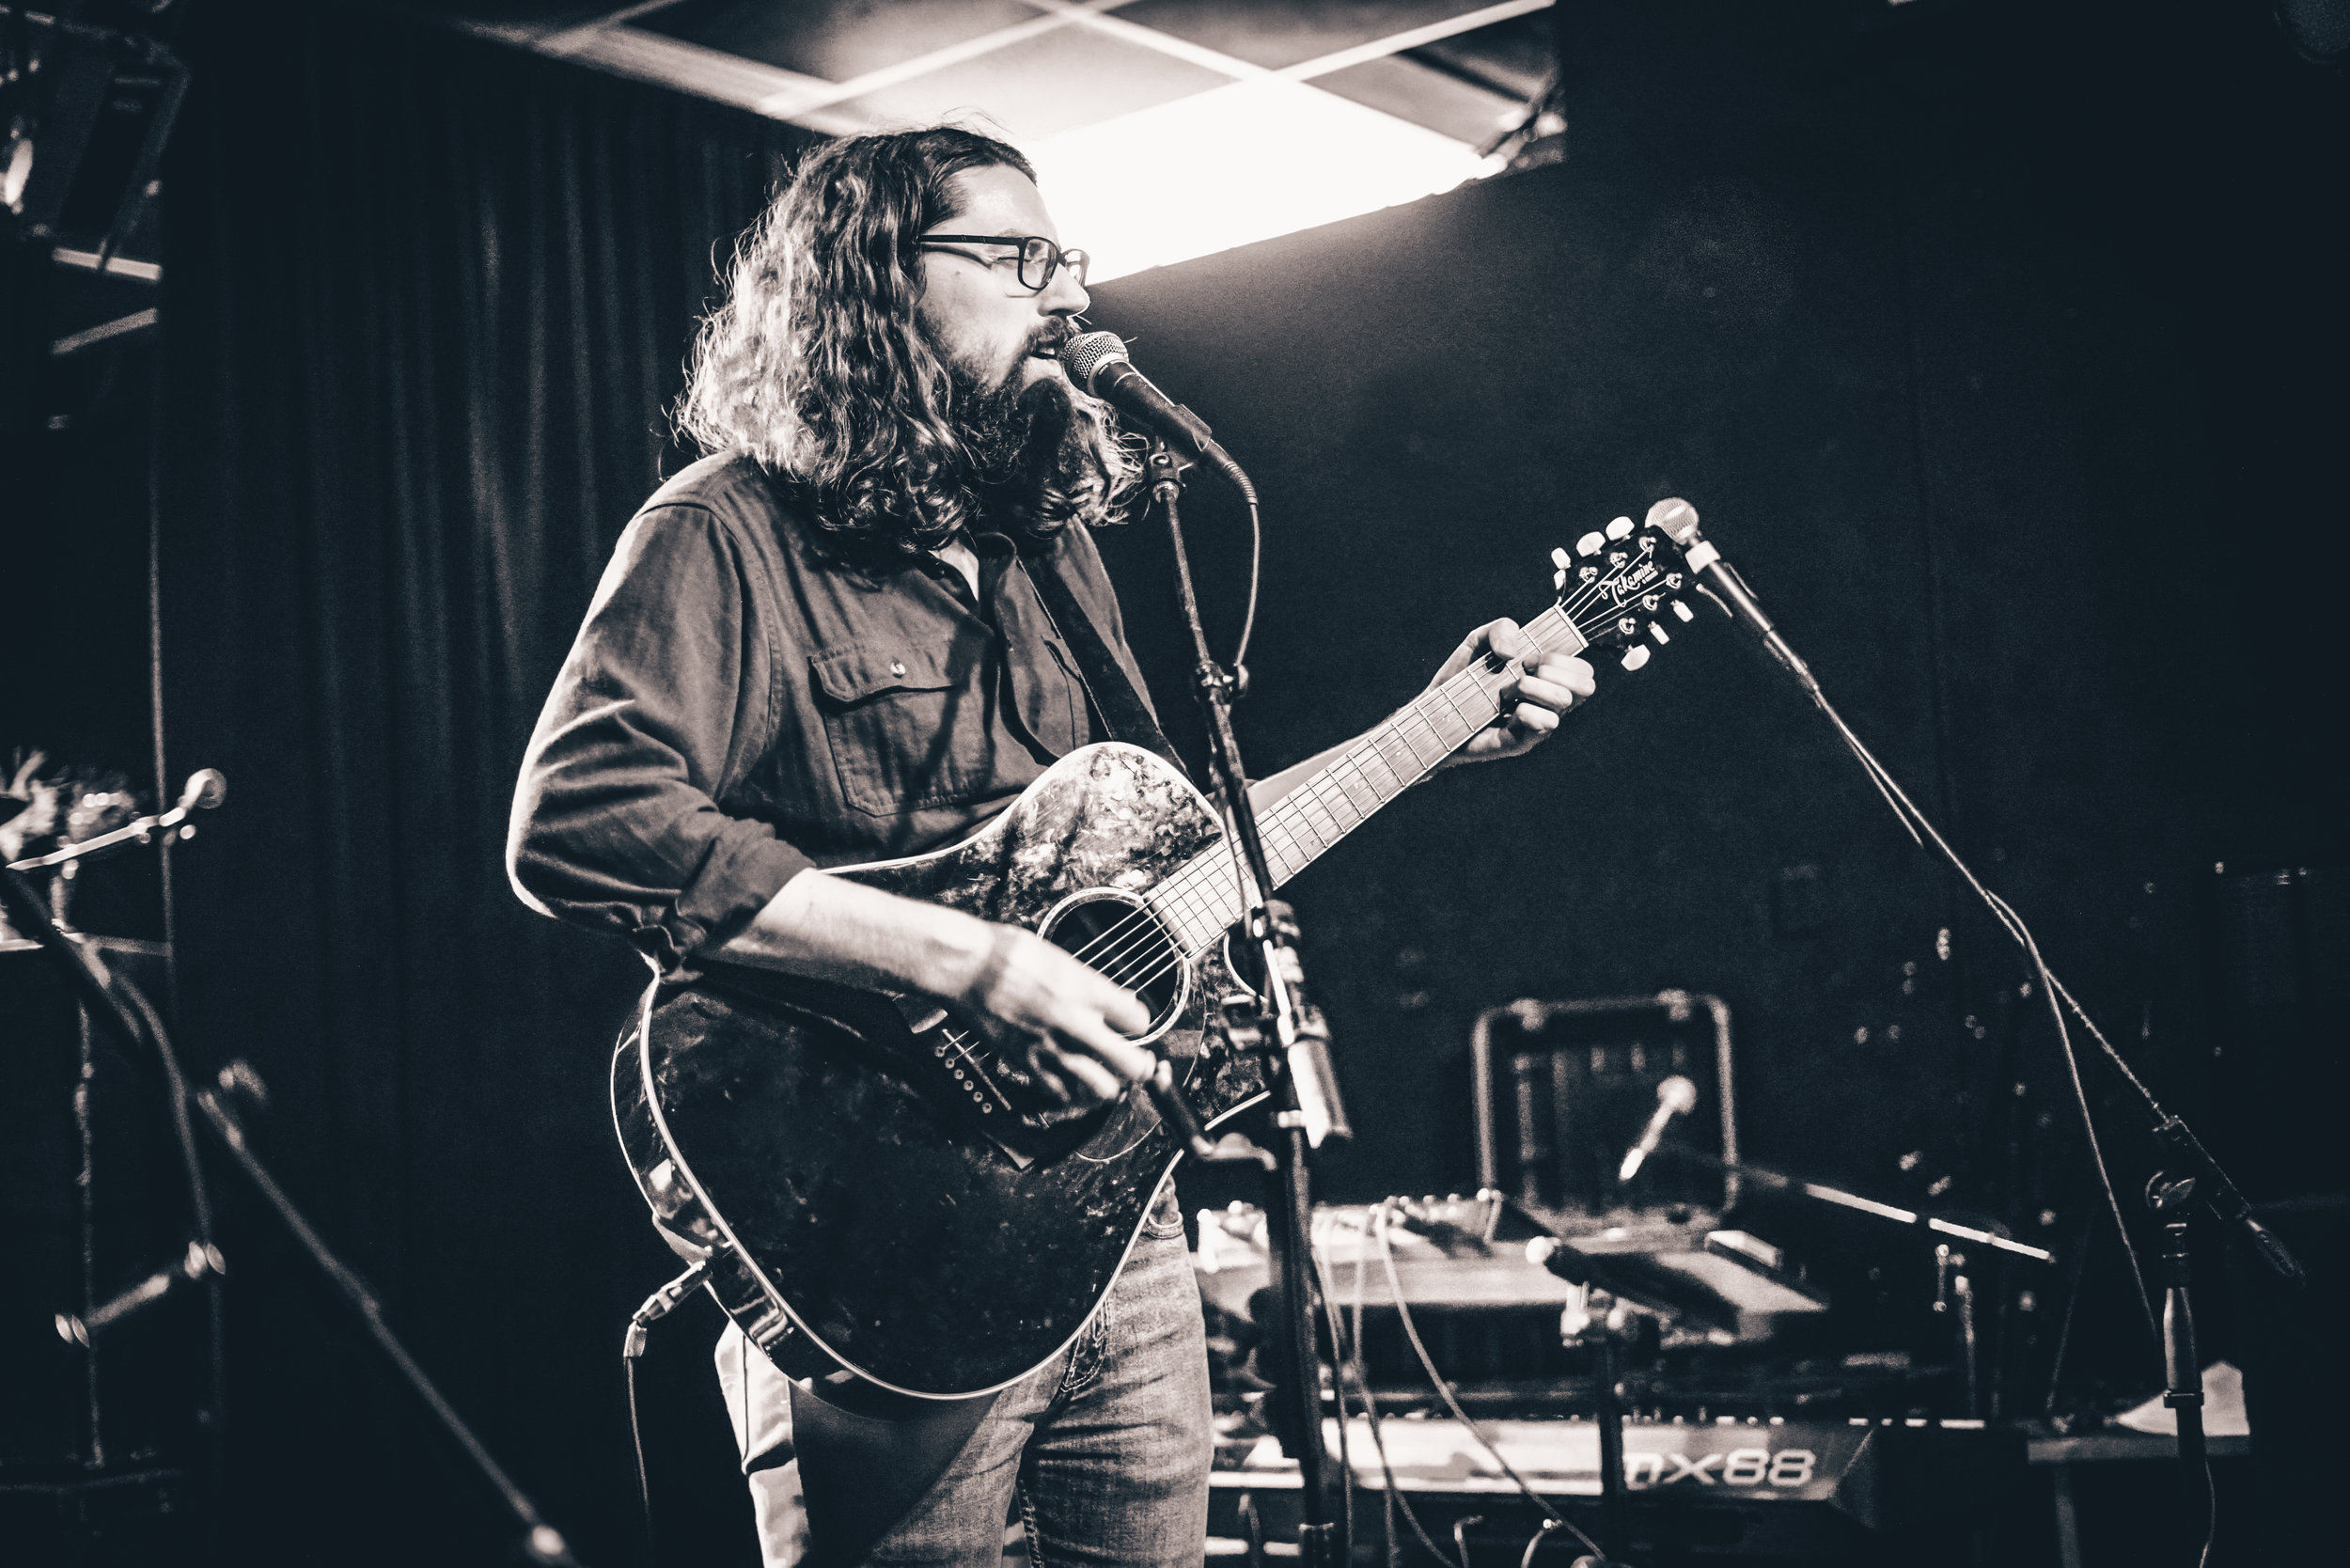 Live at The Ante Room - 3.1.18 - Charlottesville, VA